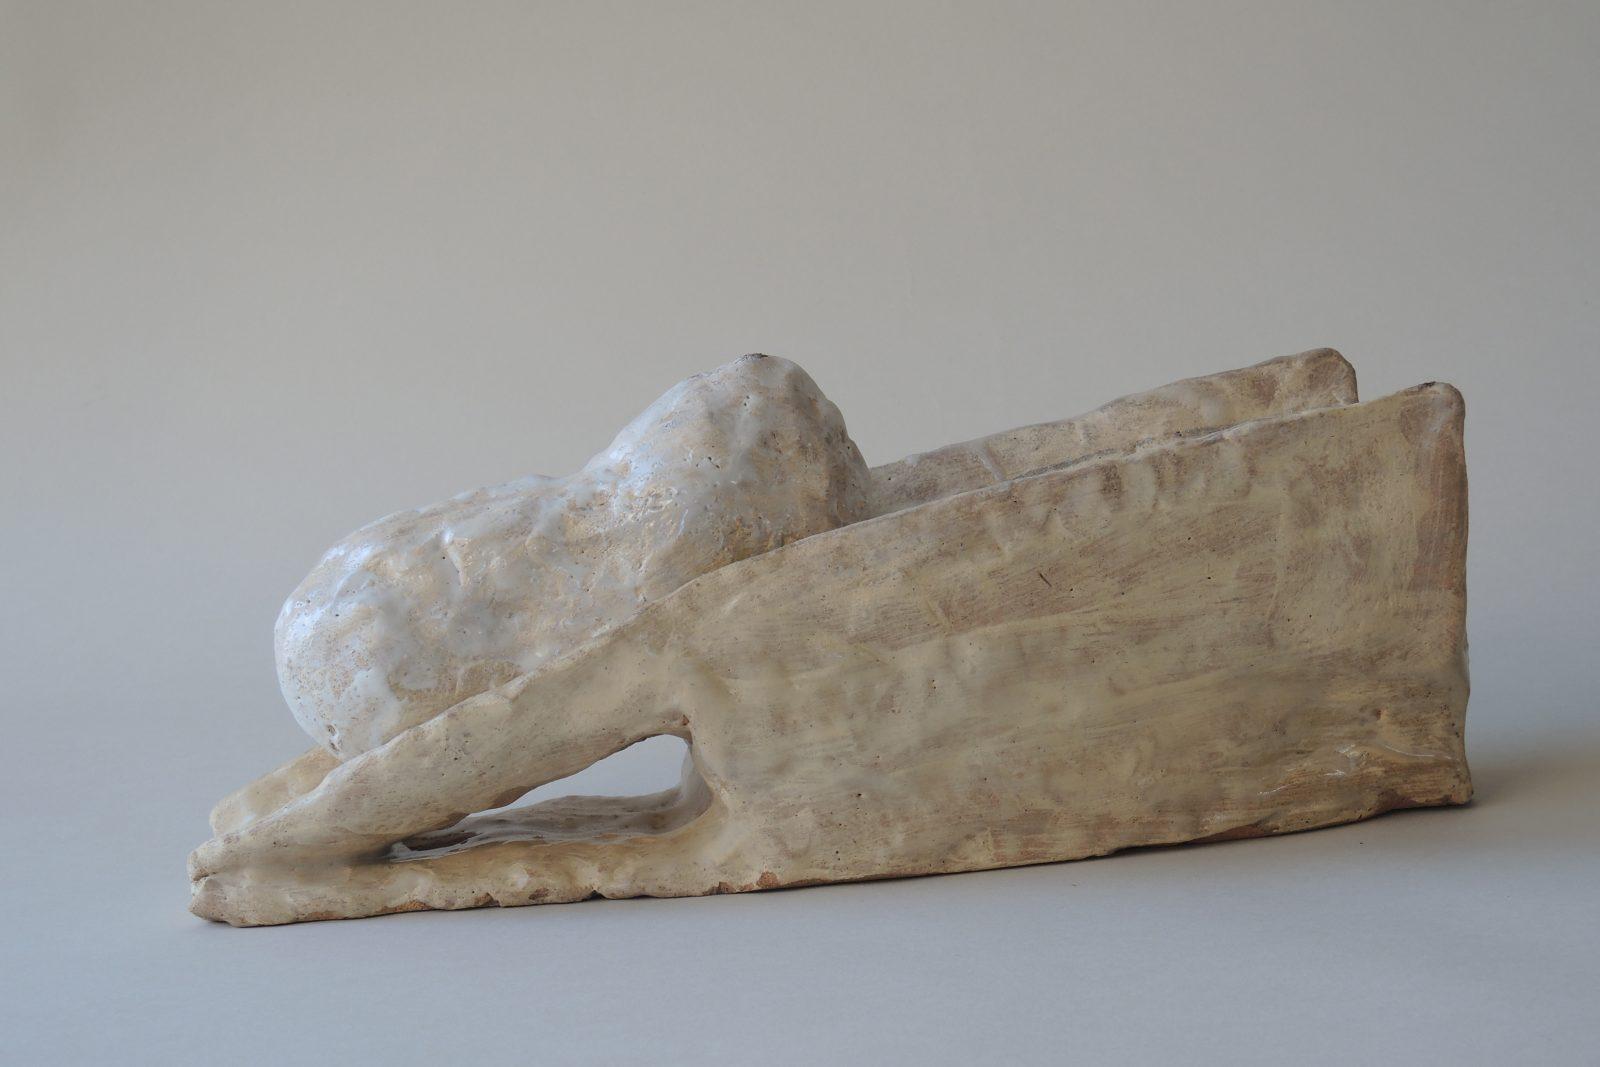 Hans Fischer –Keil –2017, 15x35x10cm –Galerie Metzger Gallery Collect London Kunst Keramik Plastik Art Ceramics Sculpture